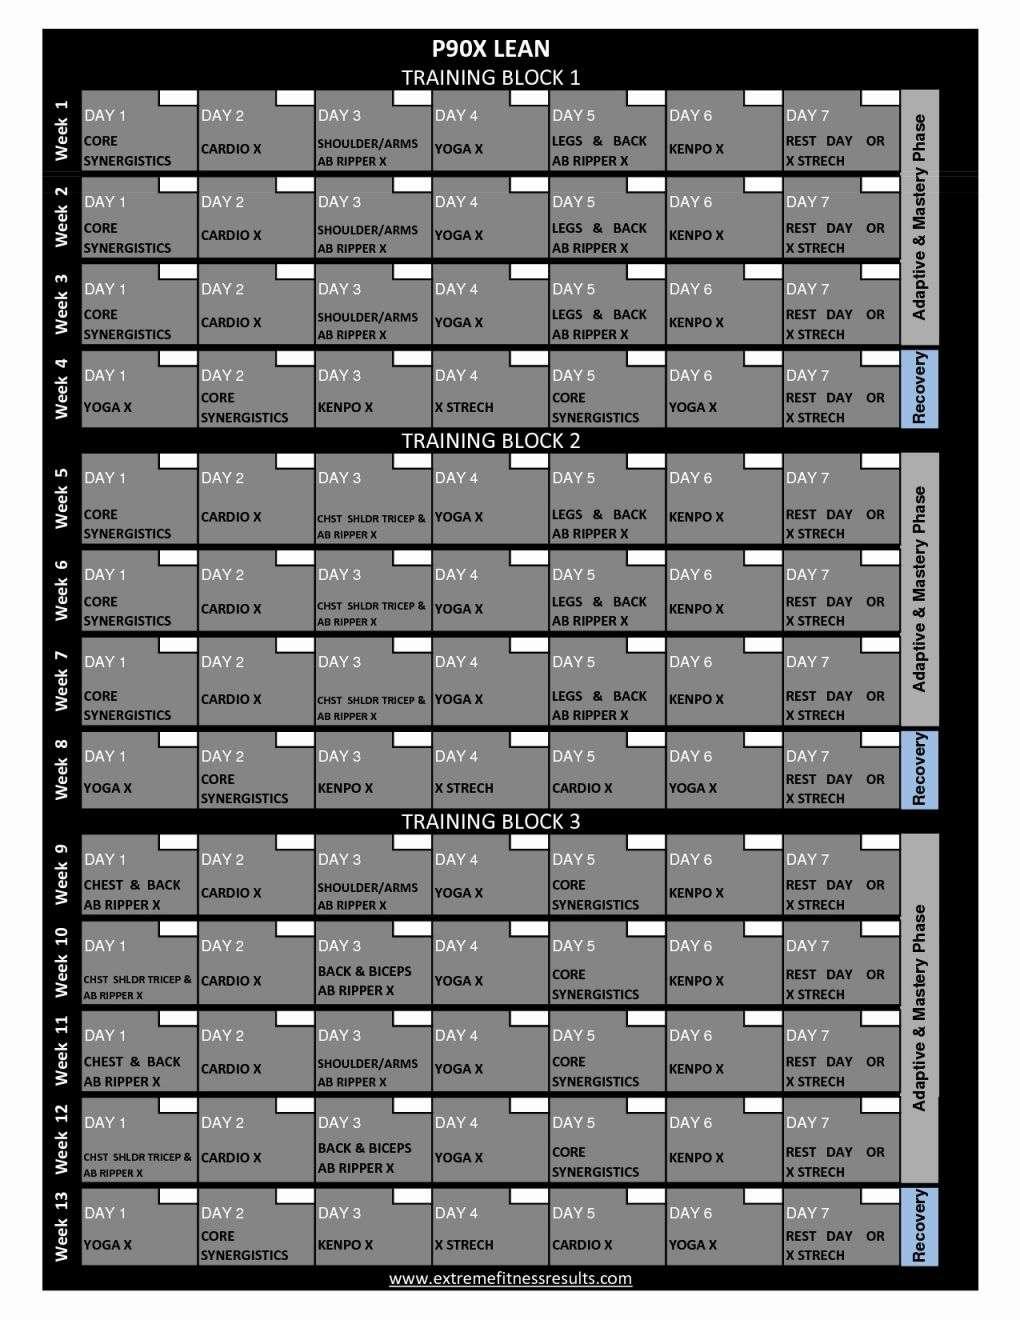 Body Beast Meal Plan Spreadsheet Throughout Body Beast Meal Plan Spreadsheet  Readleaf Document